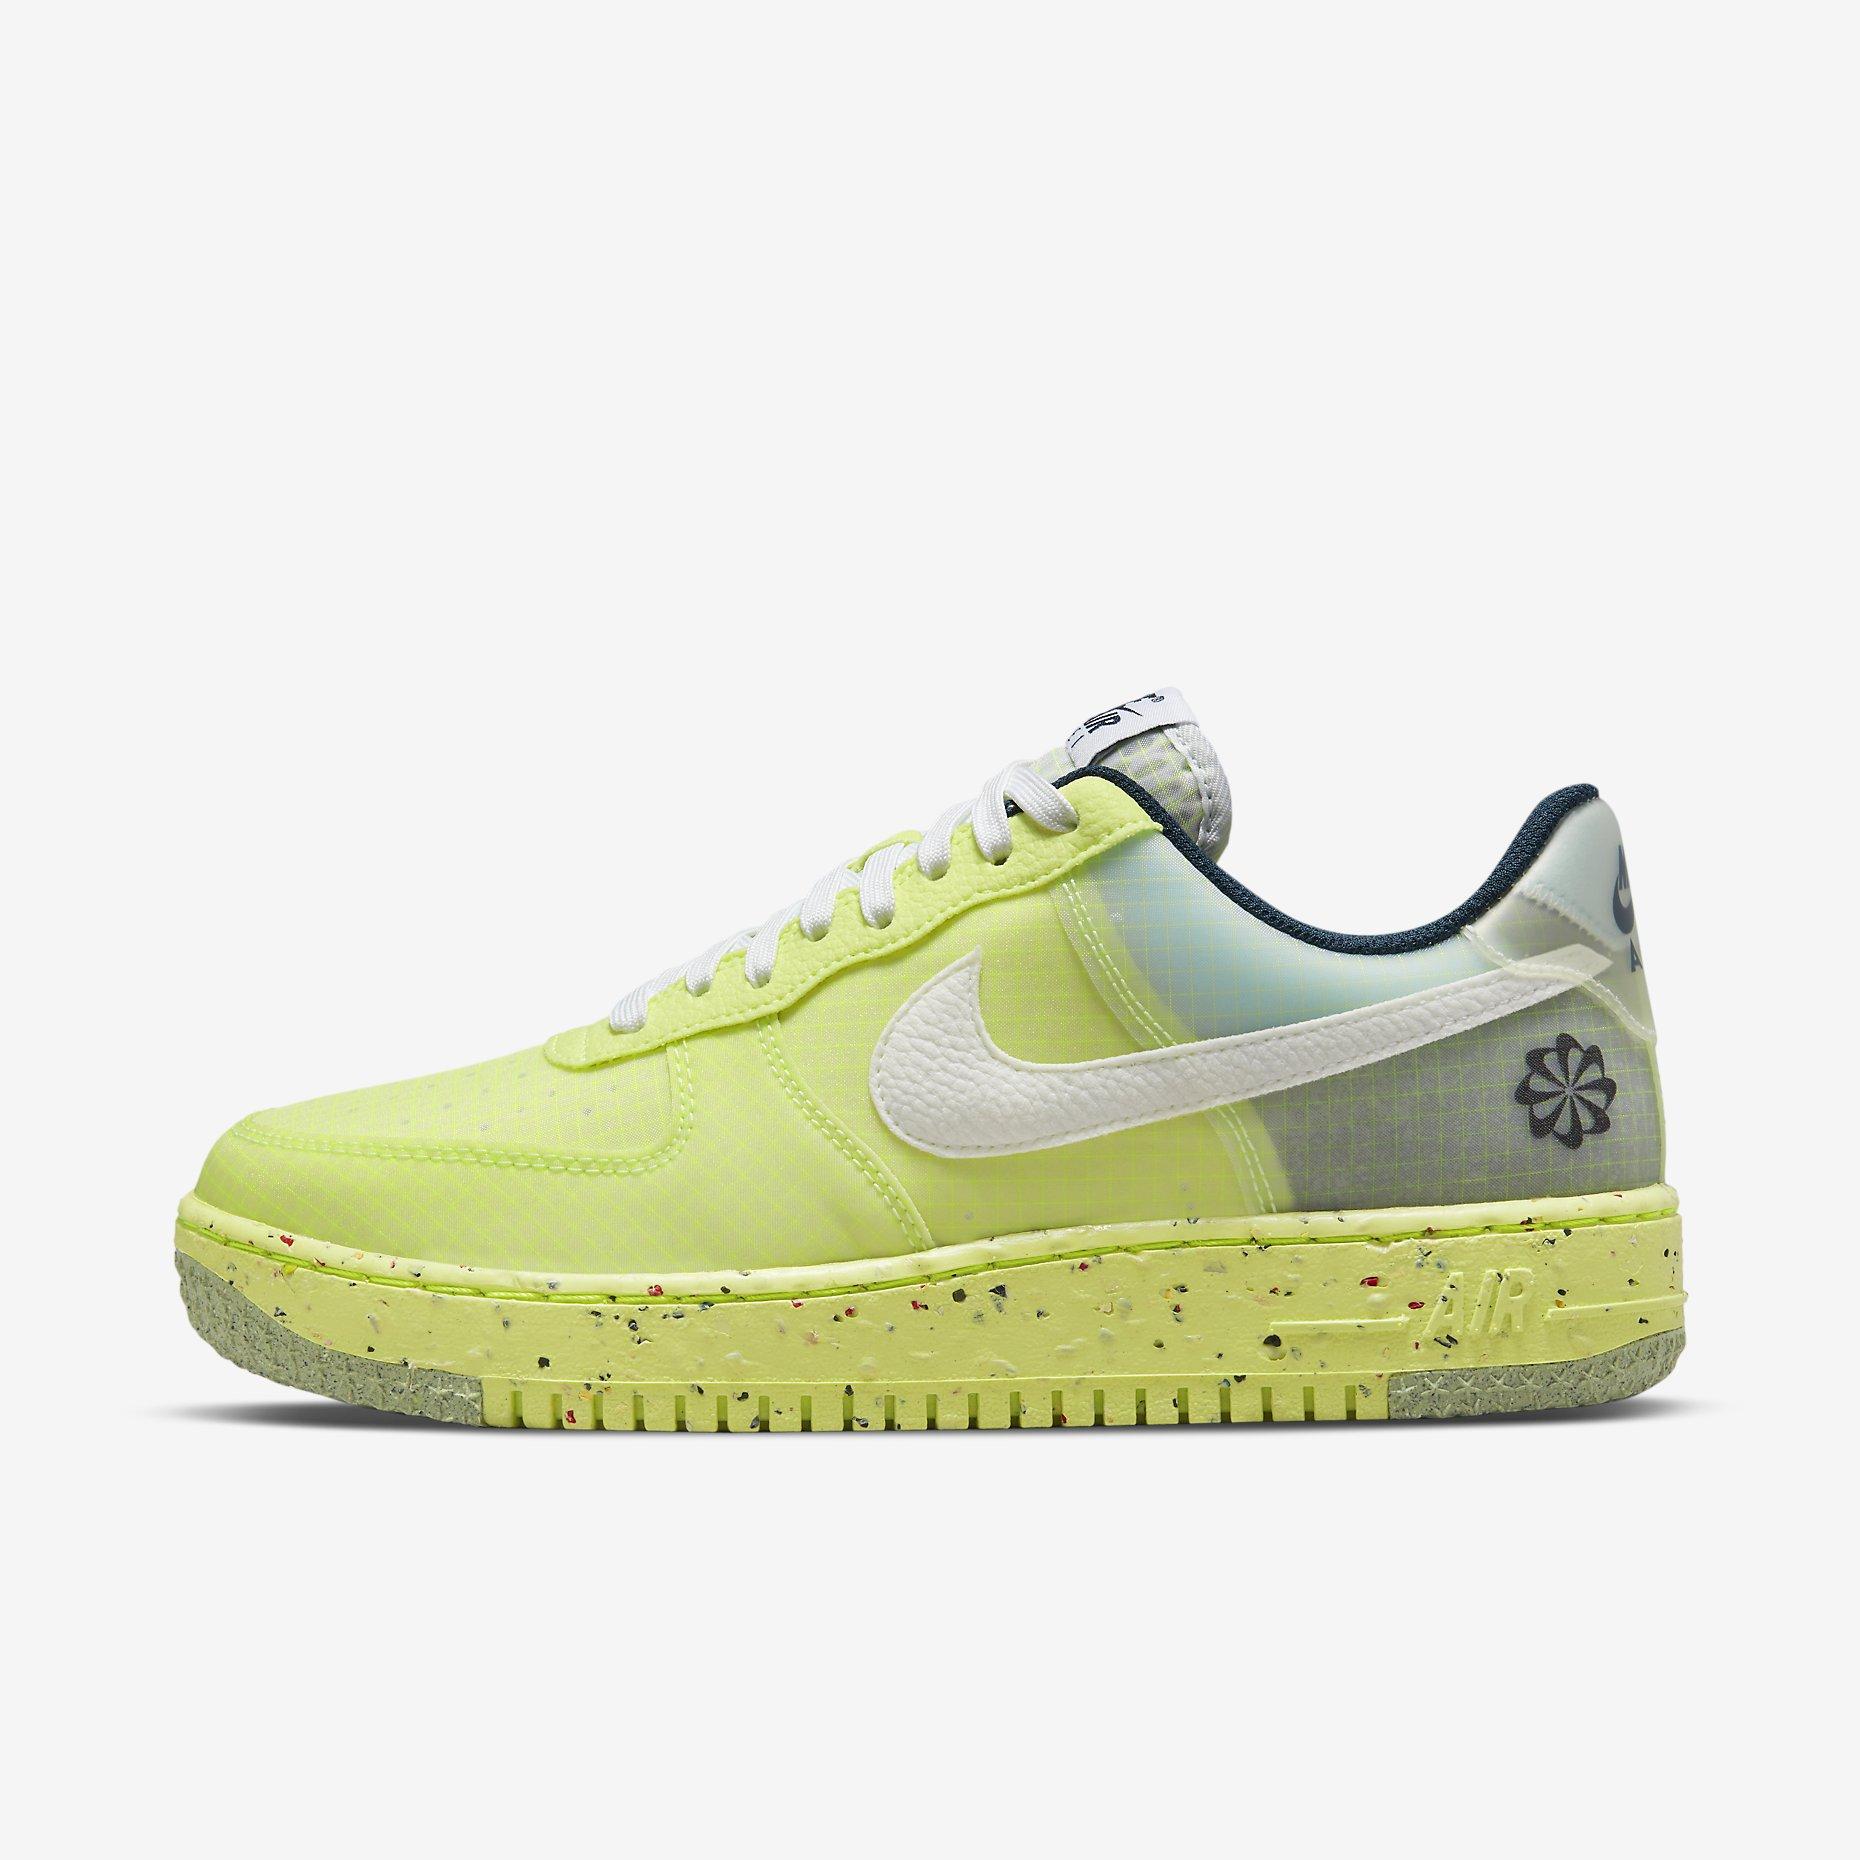 Nike Air Force 1 Low Crater 'Light Lemon Twist'